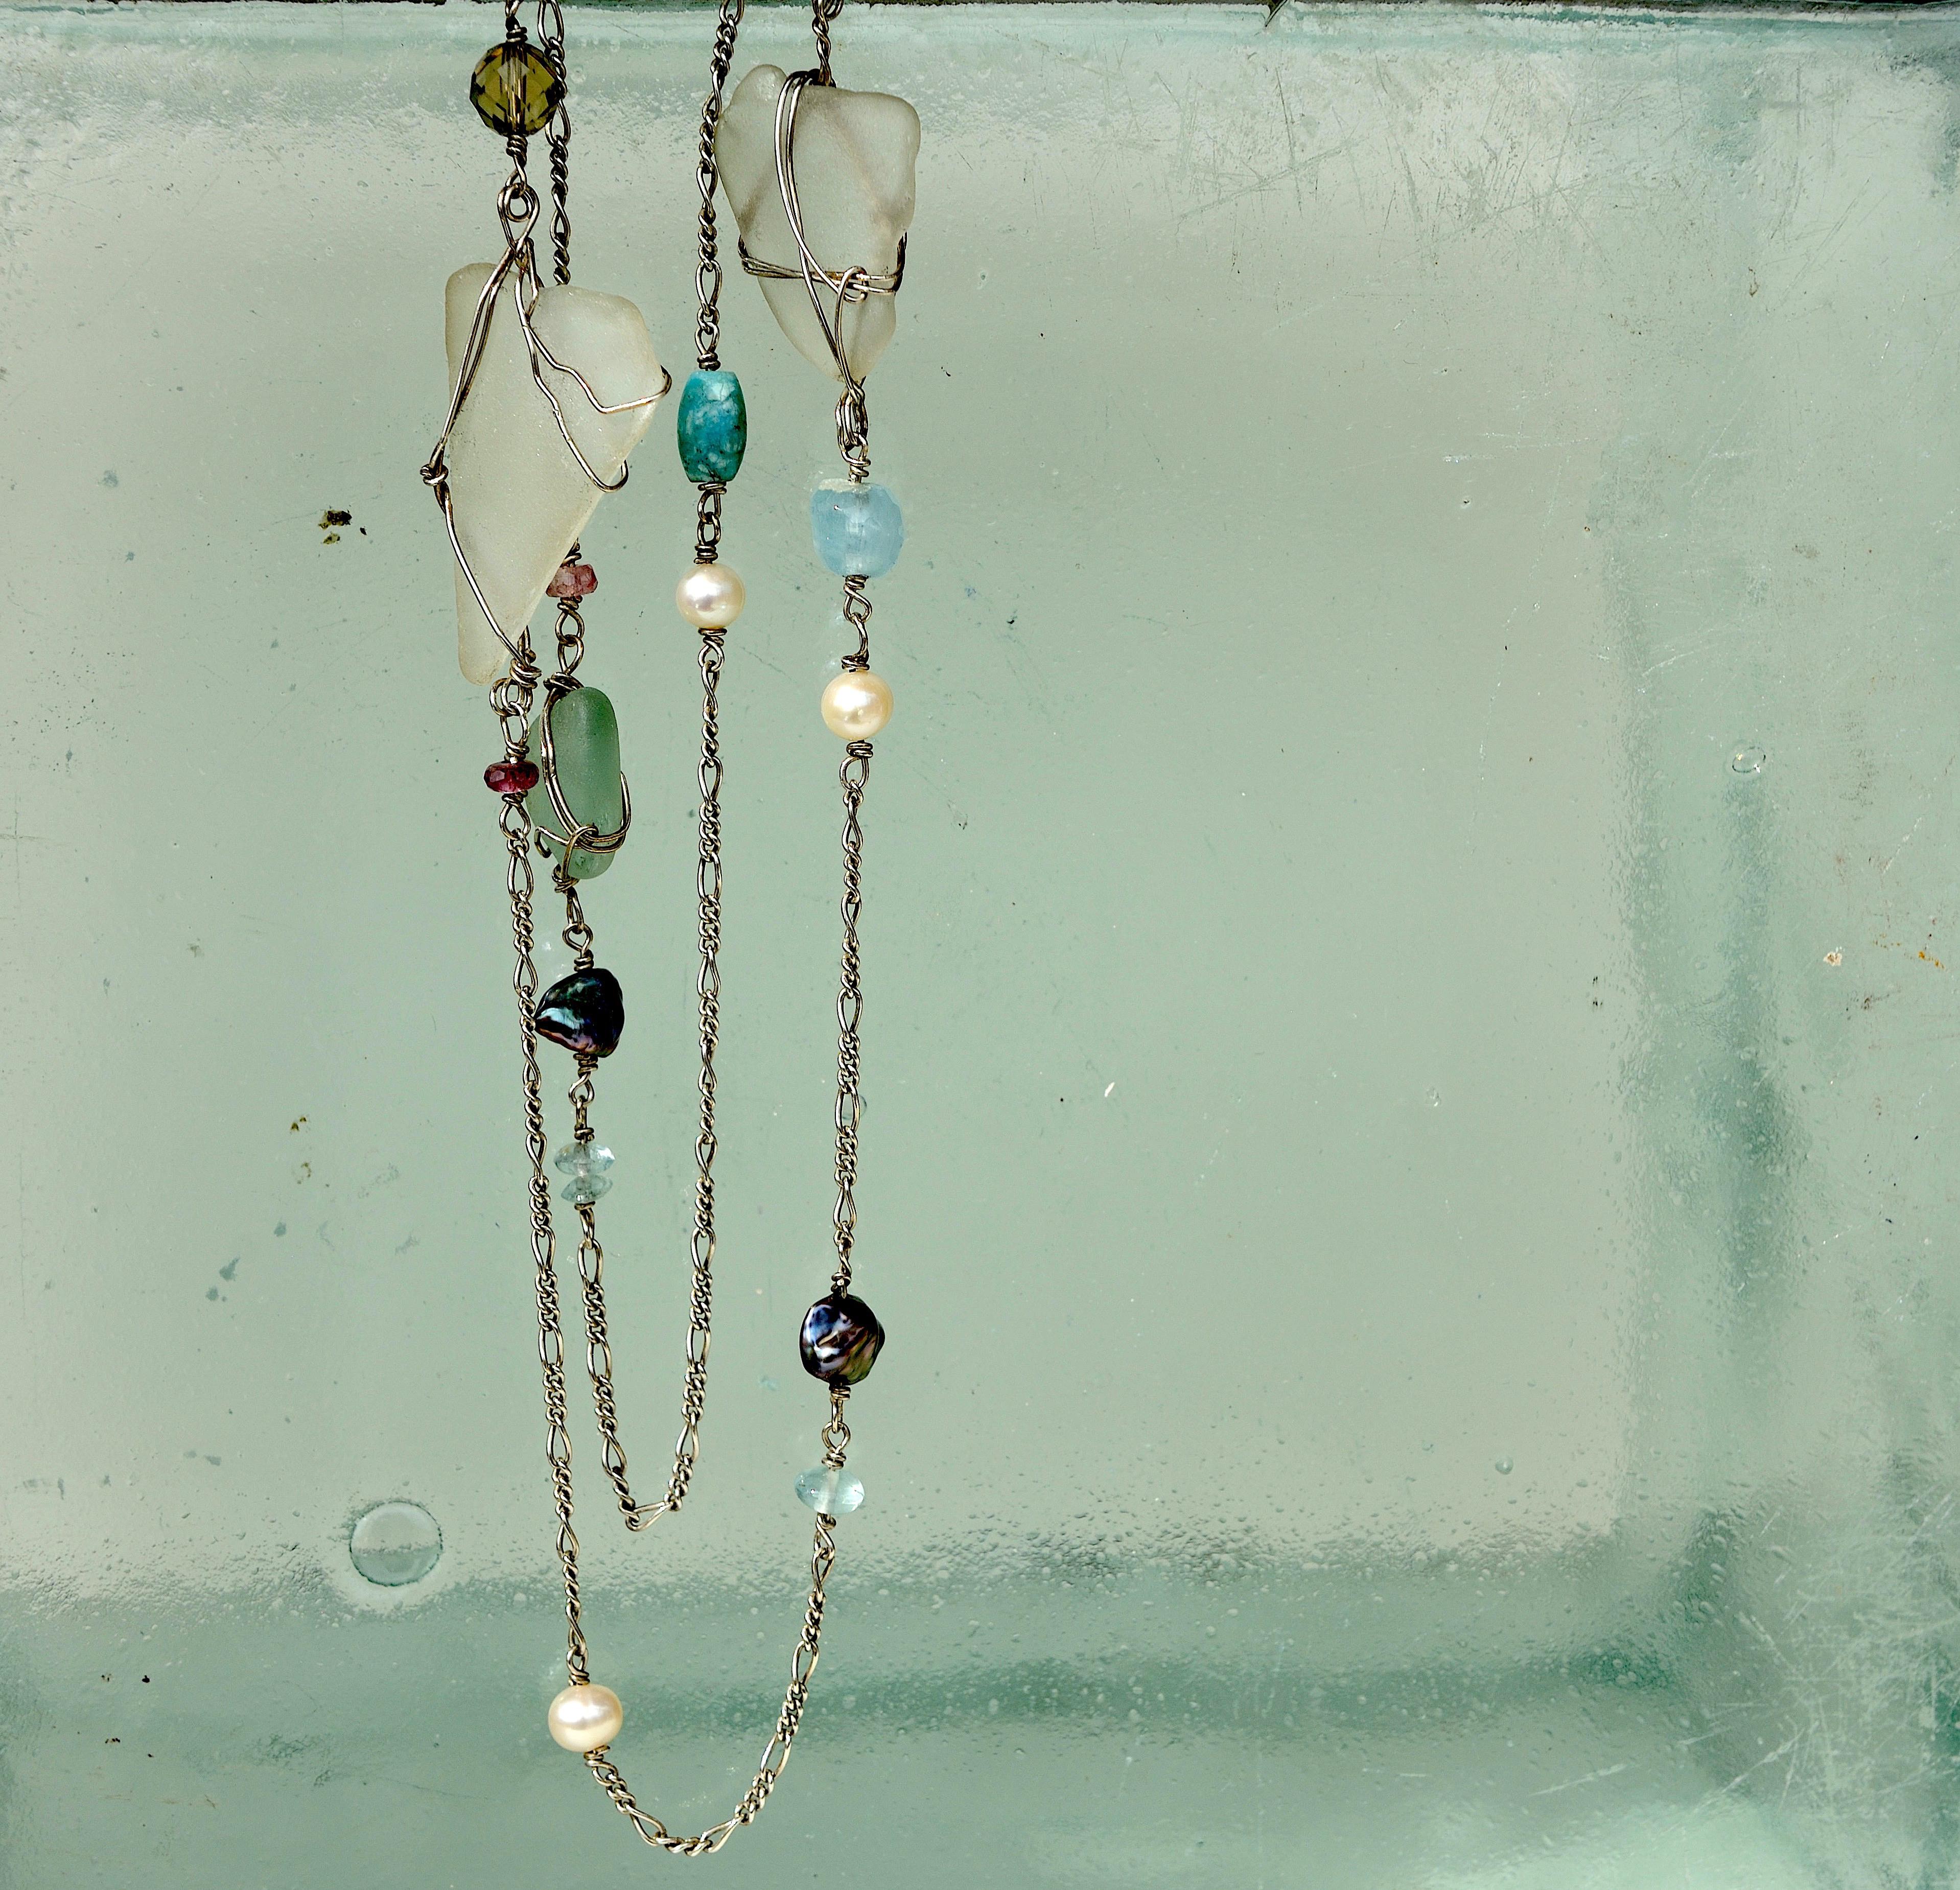 Sterling sølv kæde 925s med hav slebet glas, akvamarin, ferskvands perler, turmaliner røg kvarts